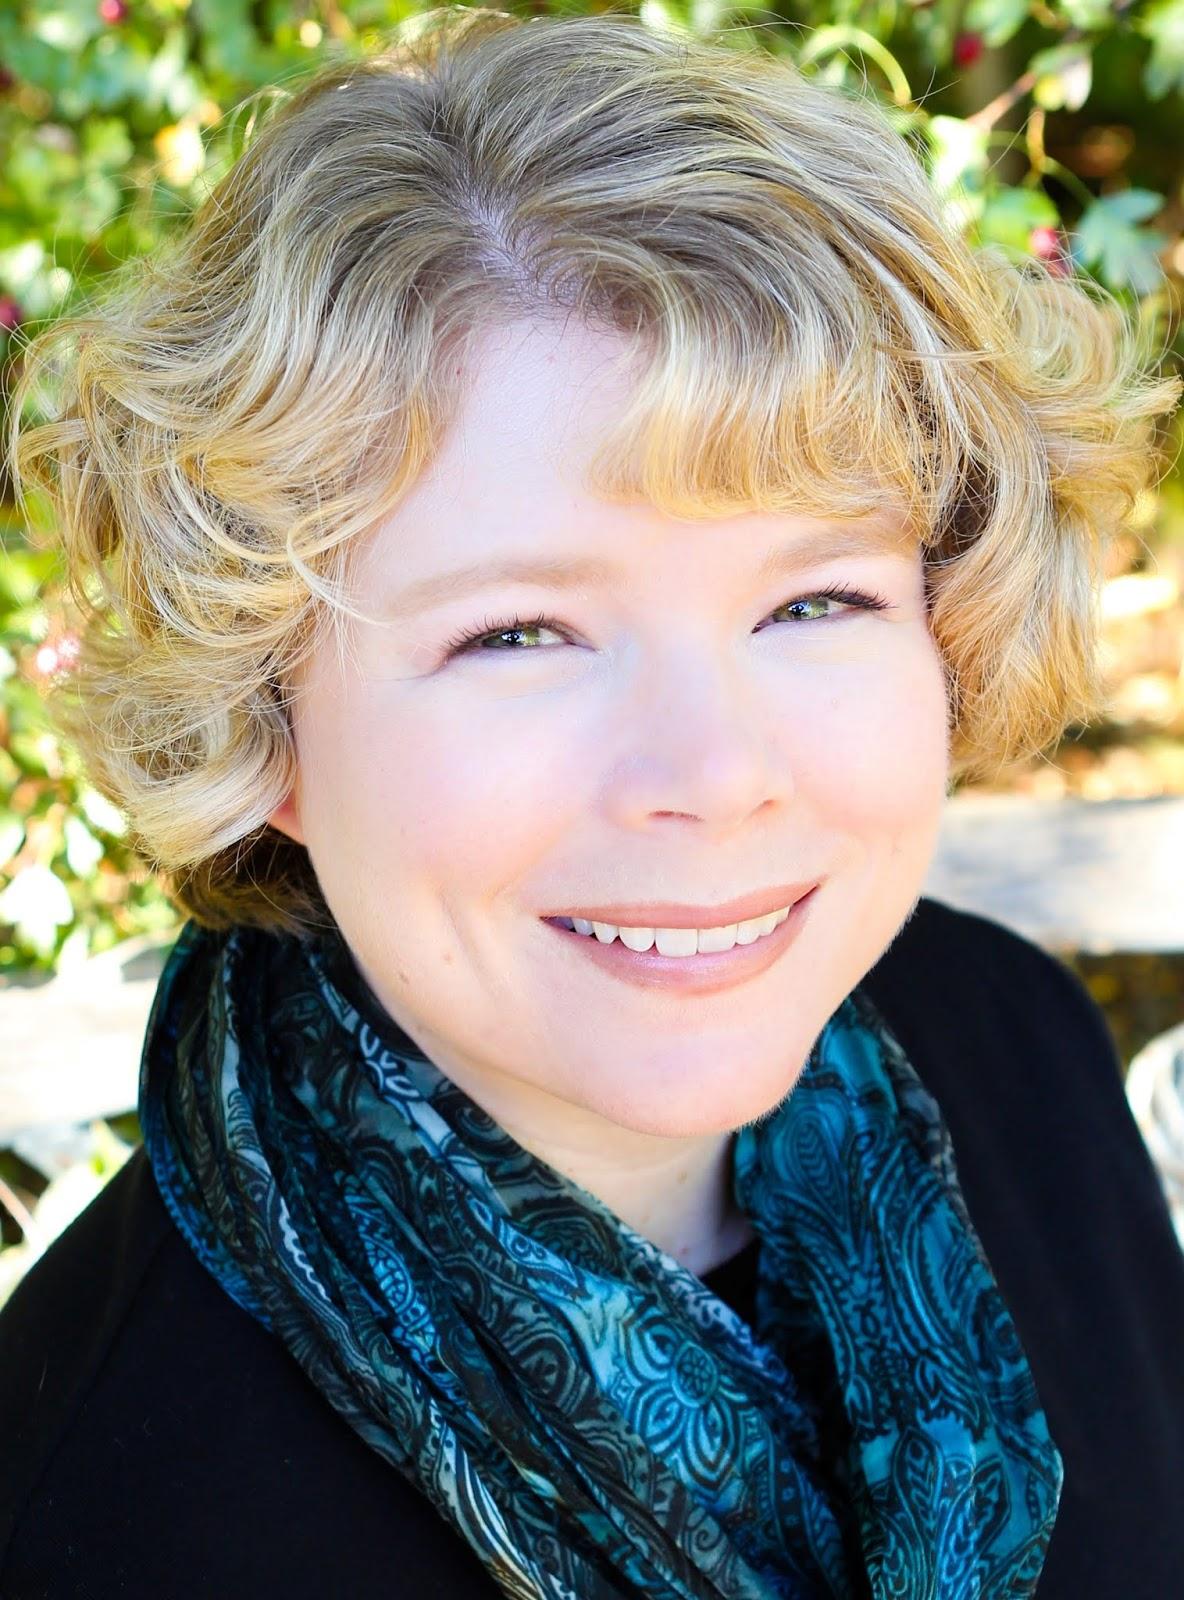 9be1314d2c Linda Shenton Matchett  Talkshow Thursday  Meet Kimberly Rose Johnson